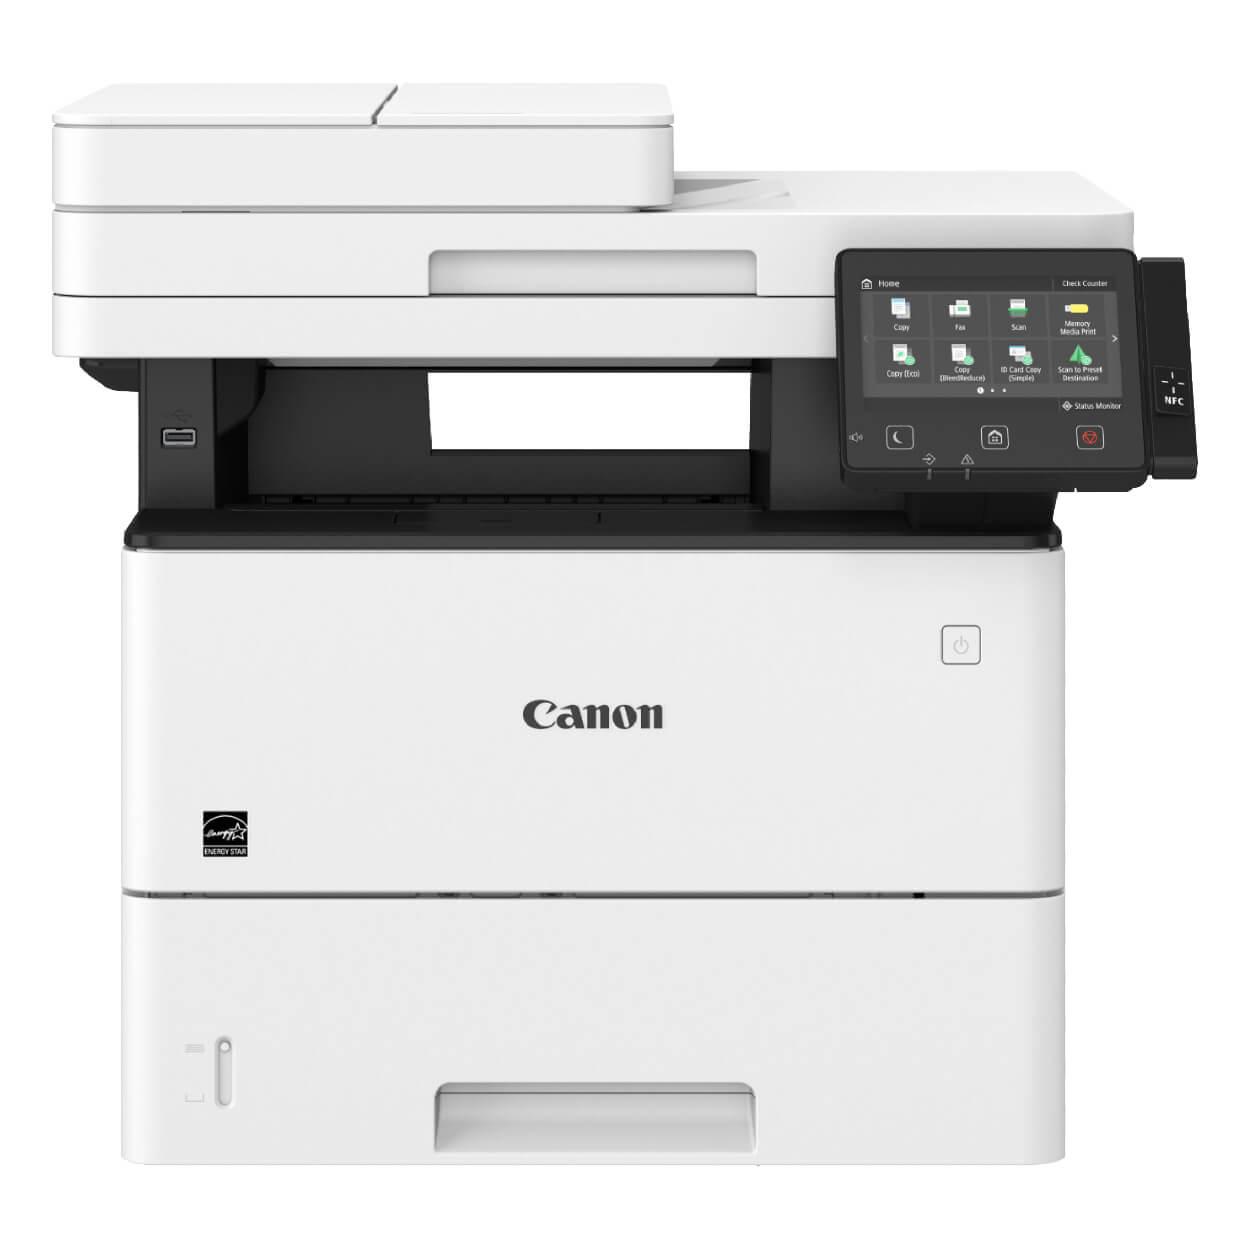 Impressora Canon imageRUNNER 1643iF